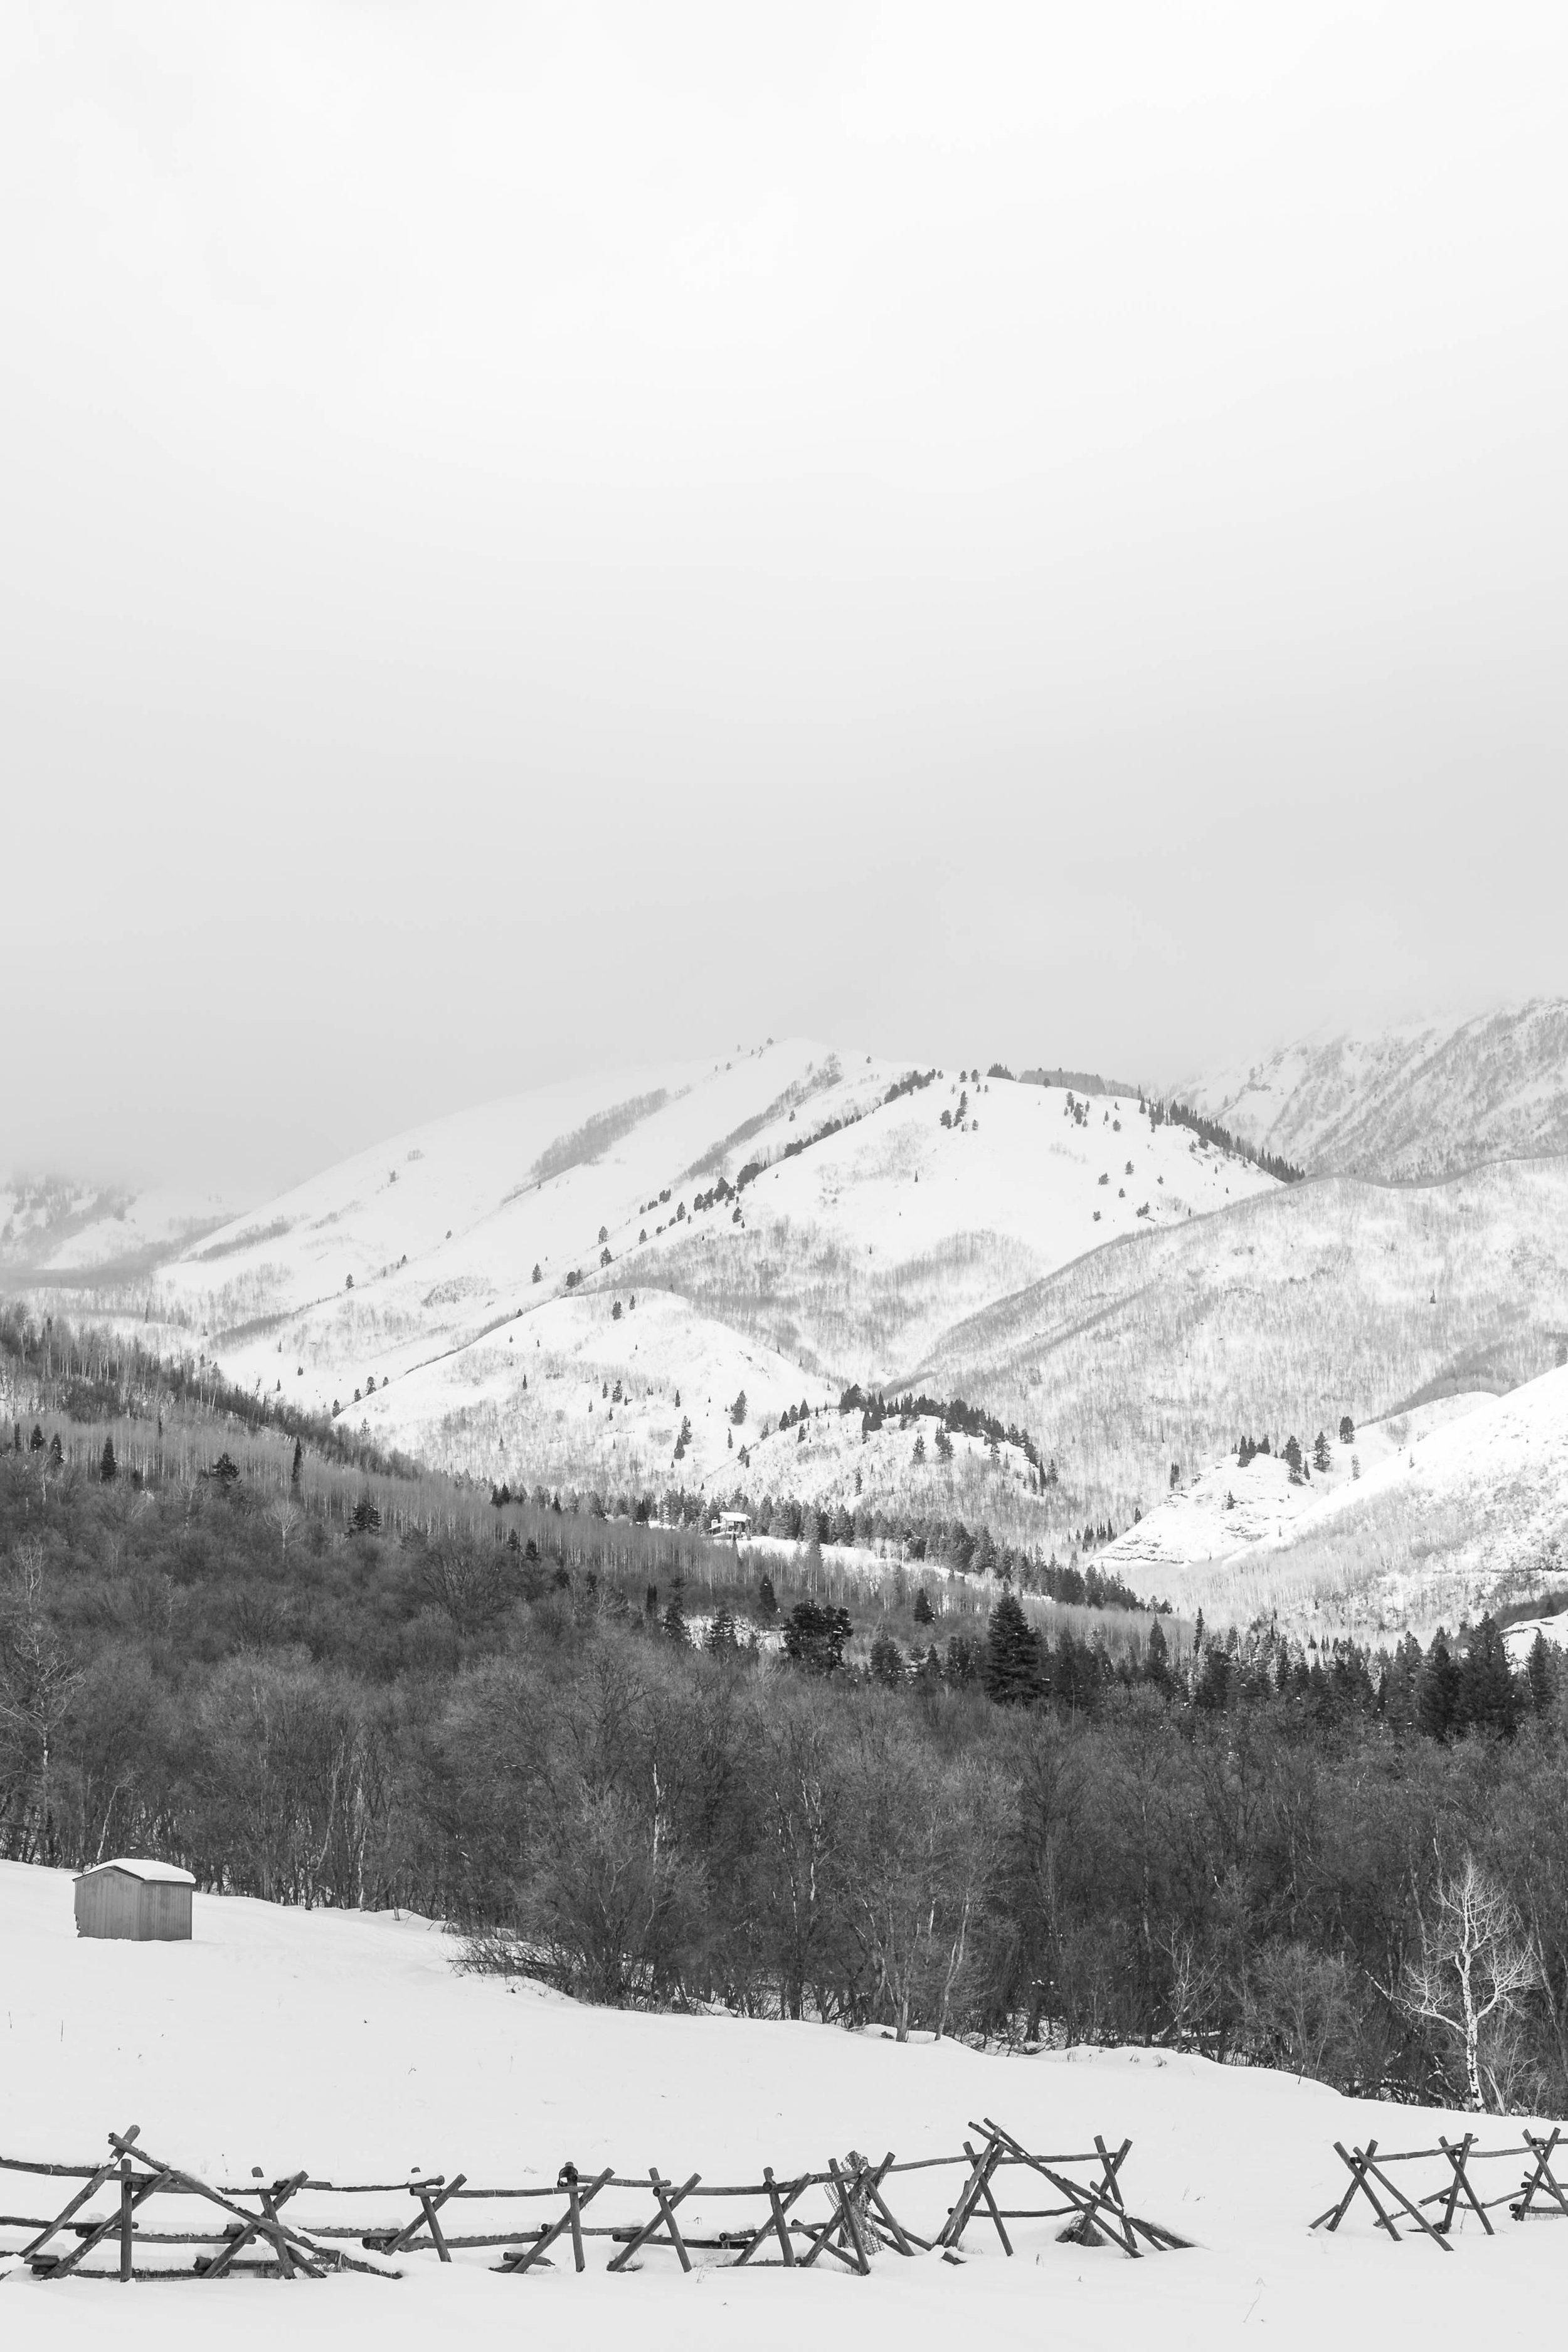 daidrismythephotography_snowshoeing-34.jpg